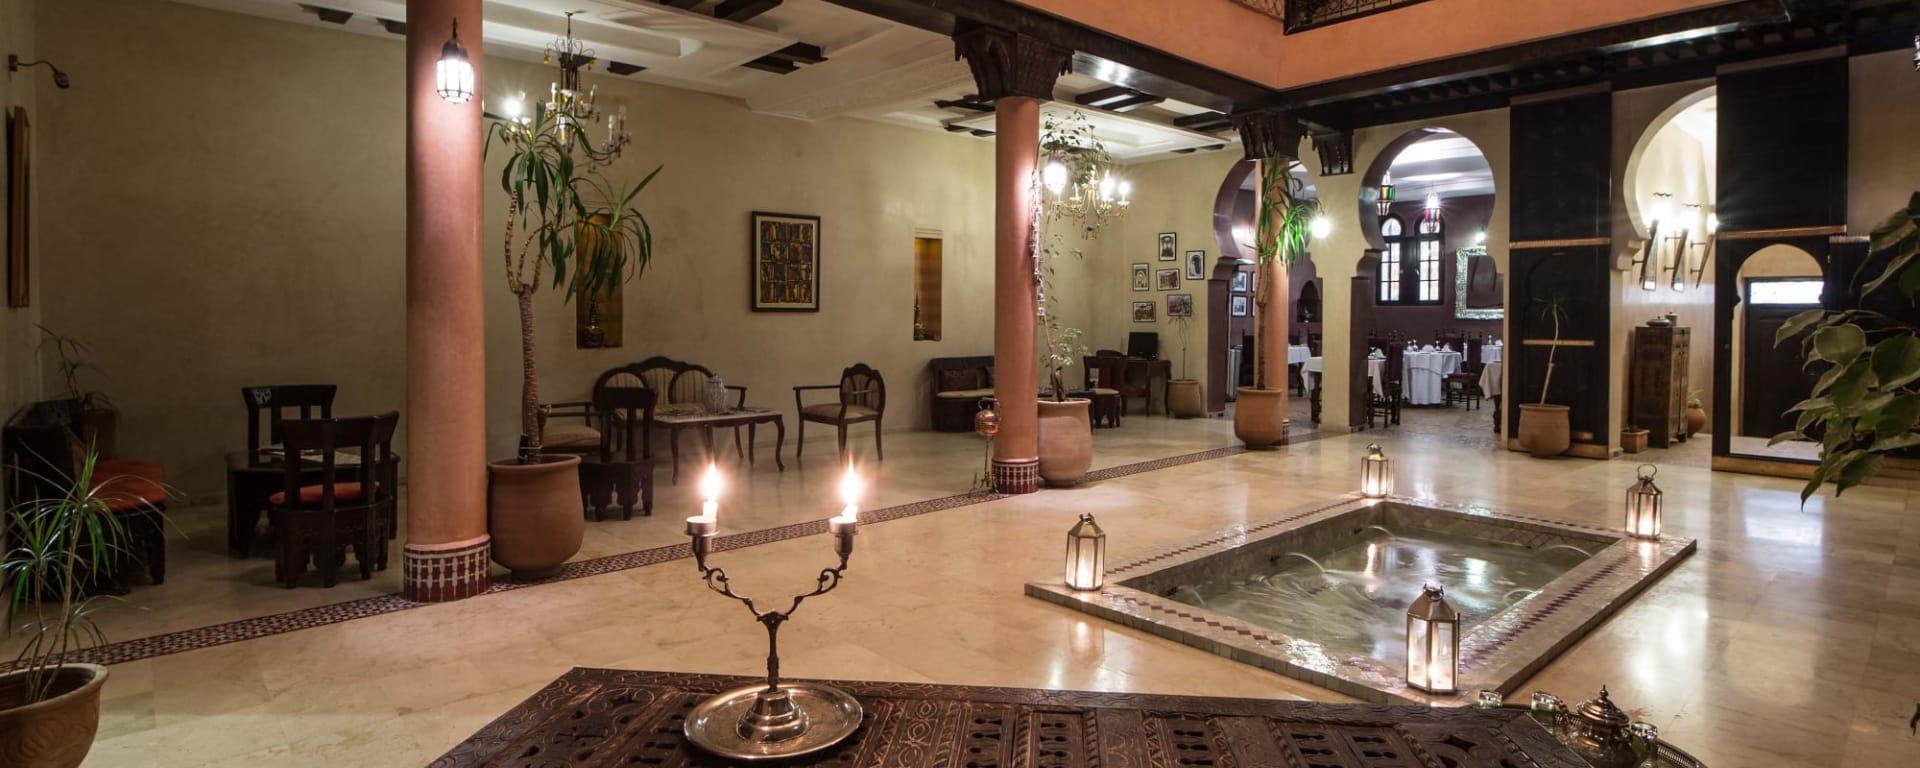 Riad Yacout in Meknès: Marokko Riad Yacout Lobby